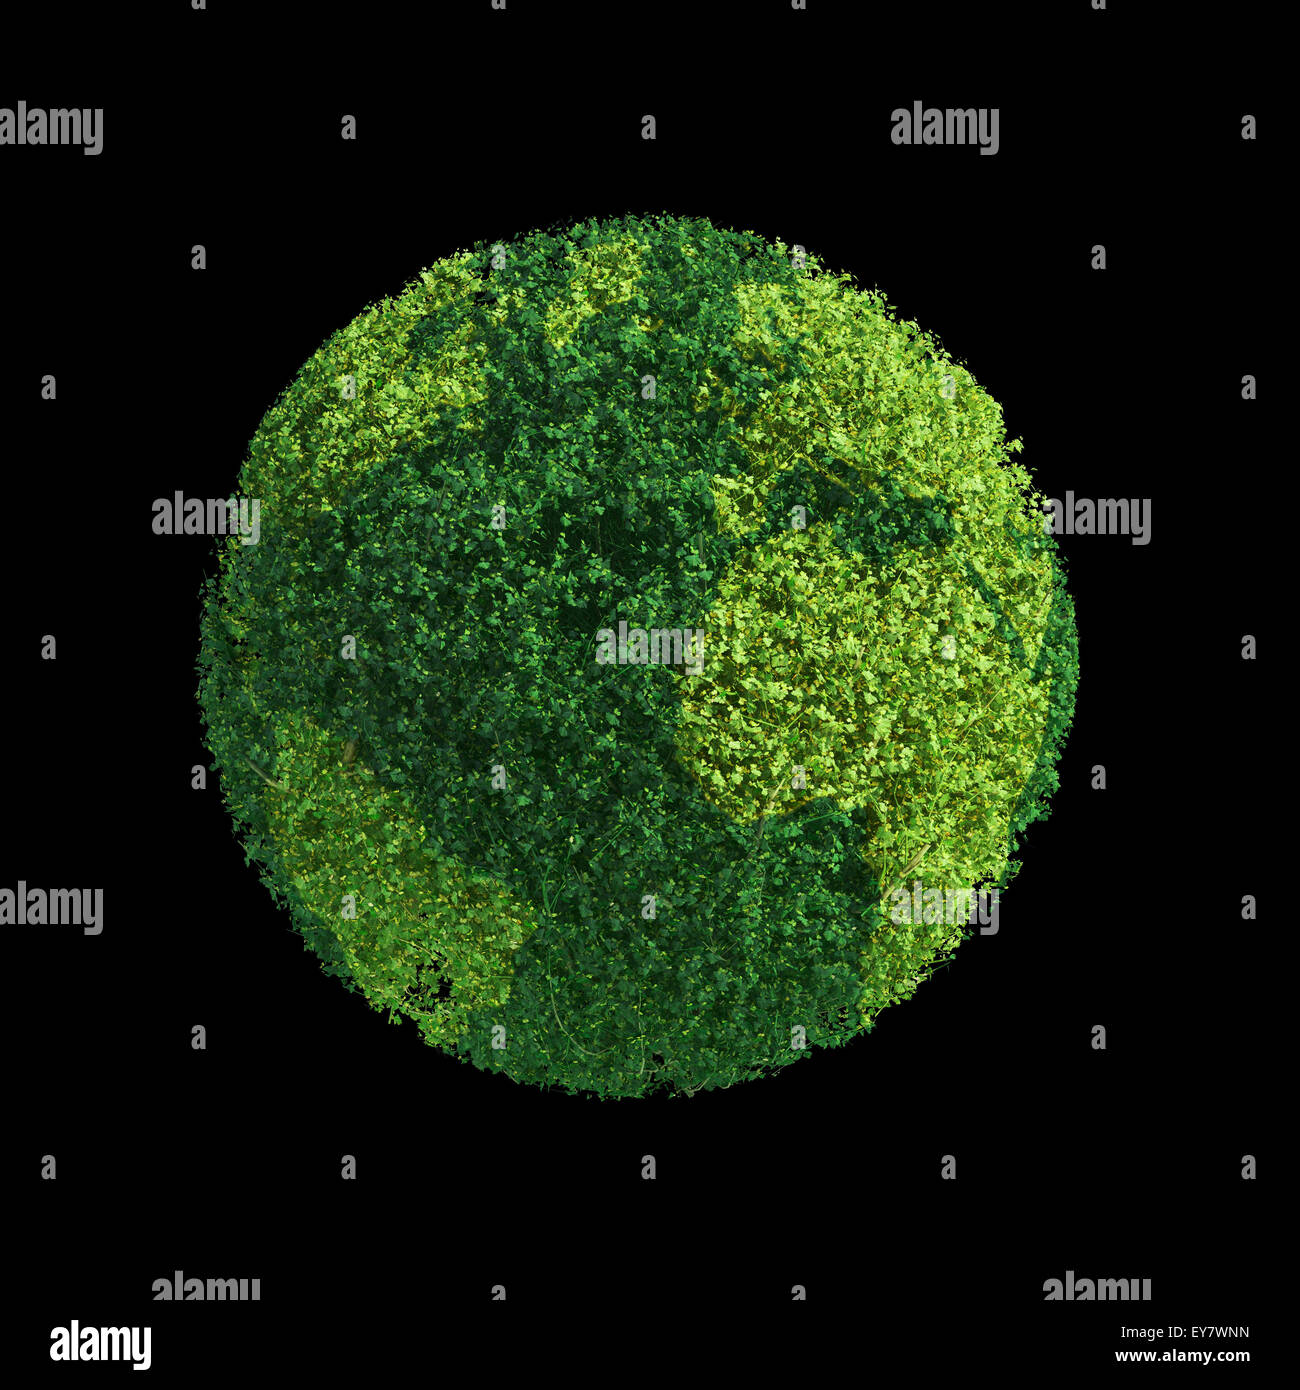 Weltkugel aus grün geformte Blätter - Ökologie-Konzept Stockbild